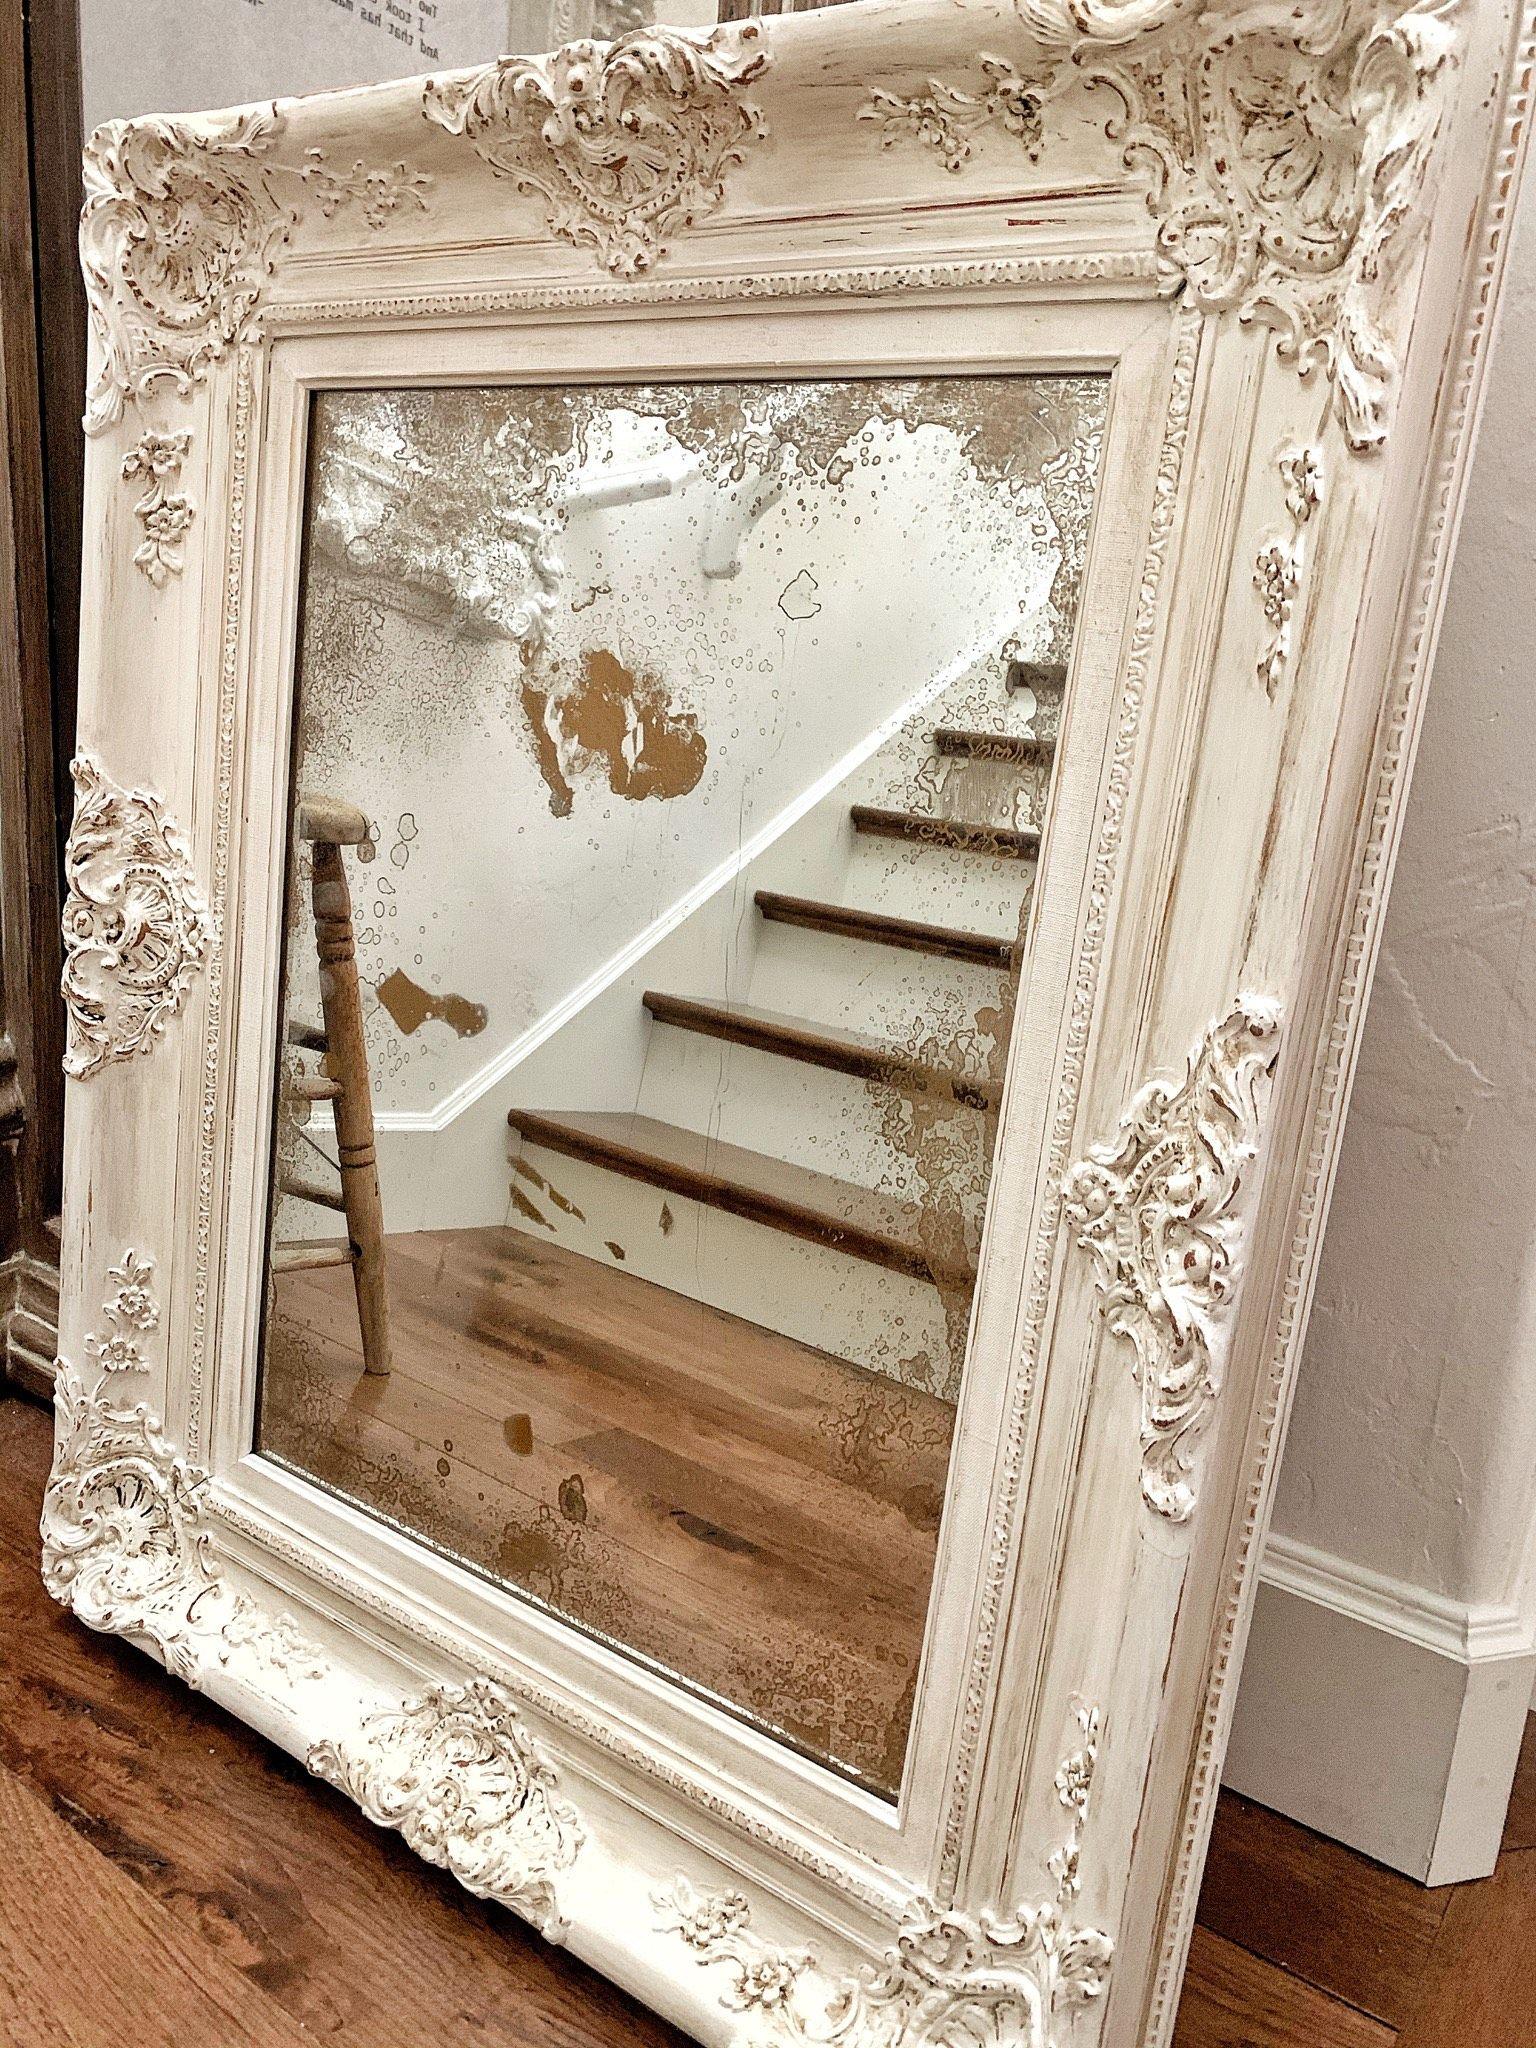 Diy Antiqued Mirror In 2020 Antique Mirror Diy Mirror Painting Antique Mirror Frame